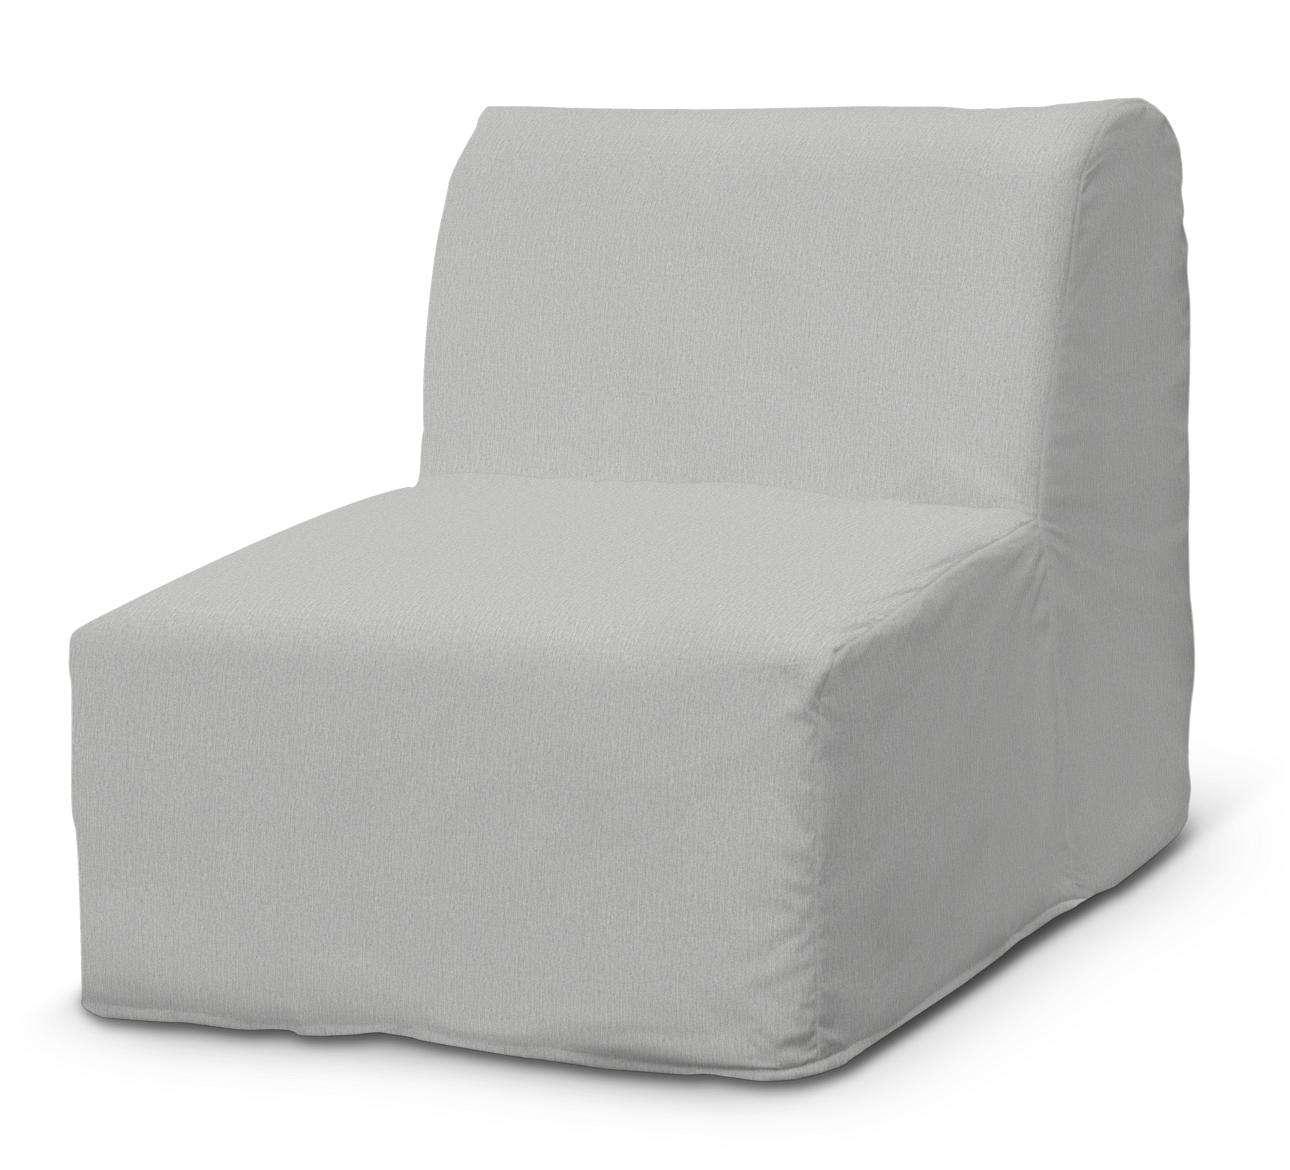 Pokrowiec na fotel Lycksele prosty fotel Lycksele w kolekcji Chenille, tkanina: 702-23